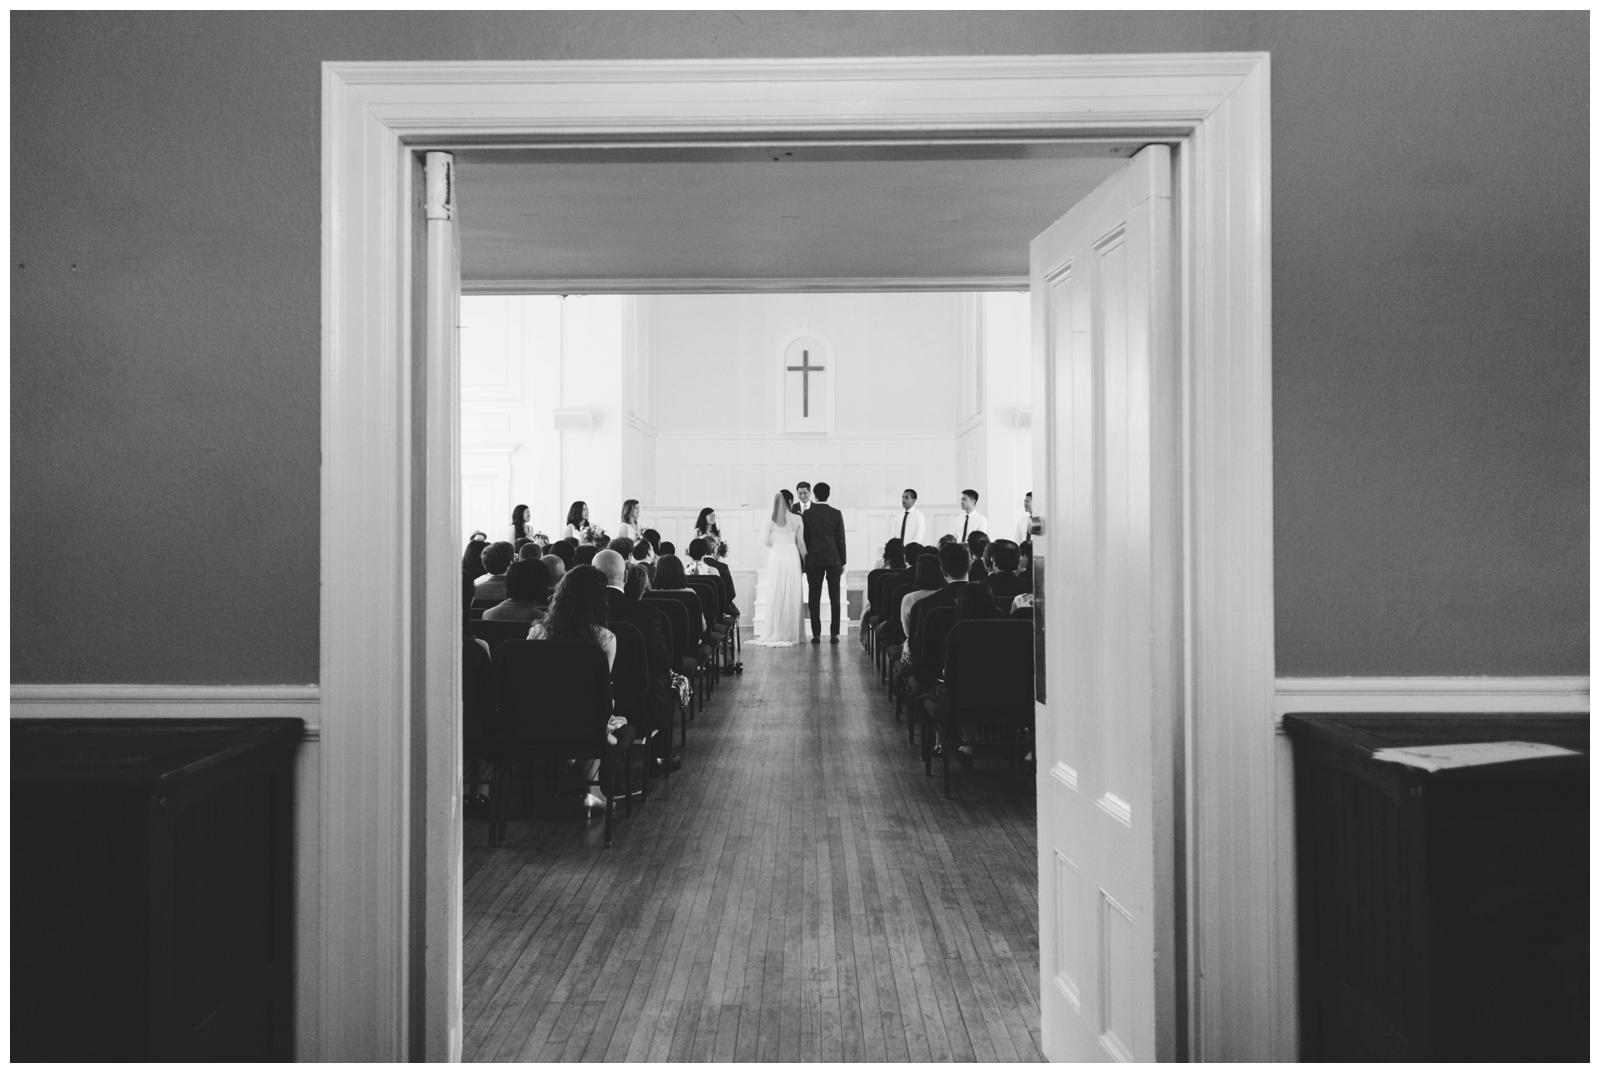 Samberg-Conference-Center-Boston-Wedding-Photographer-Bailey-Q-Photo-053.jpg